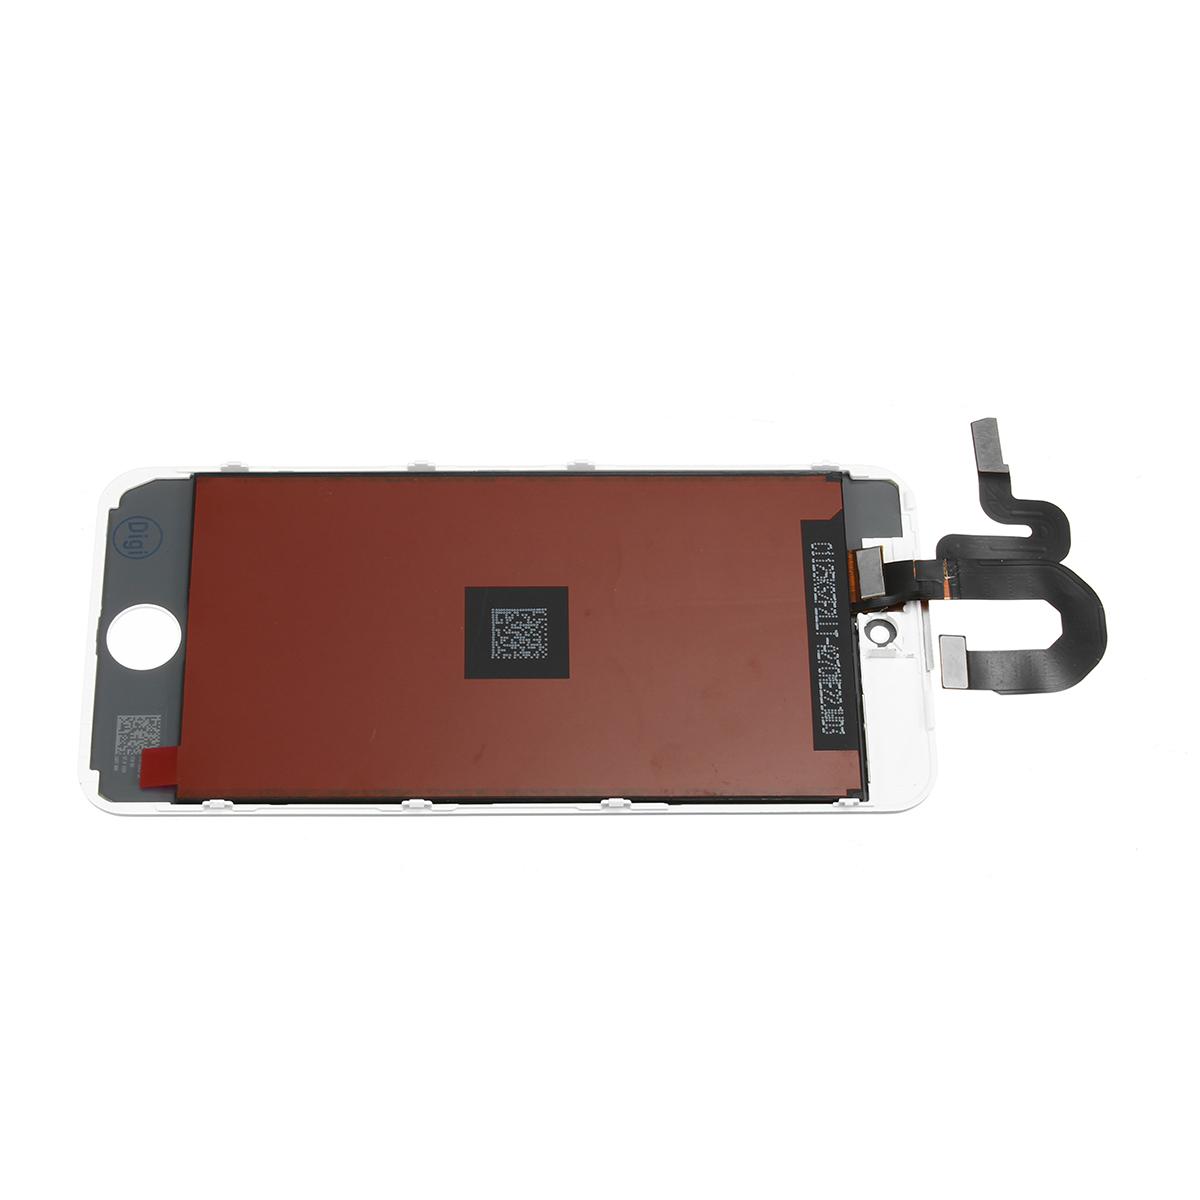 پنل-تاچ-صفحه-نمایش-آیپاد-lcd-display-touch-screen-Apple-iPod-Touch-5th(7).jpg